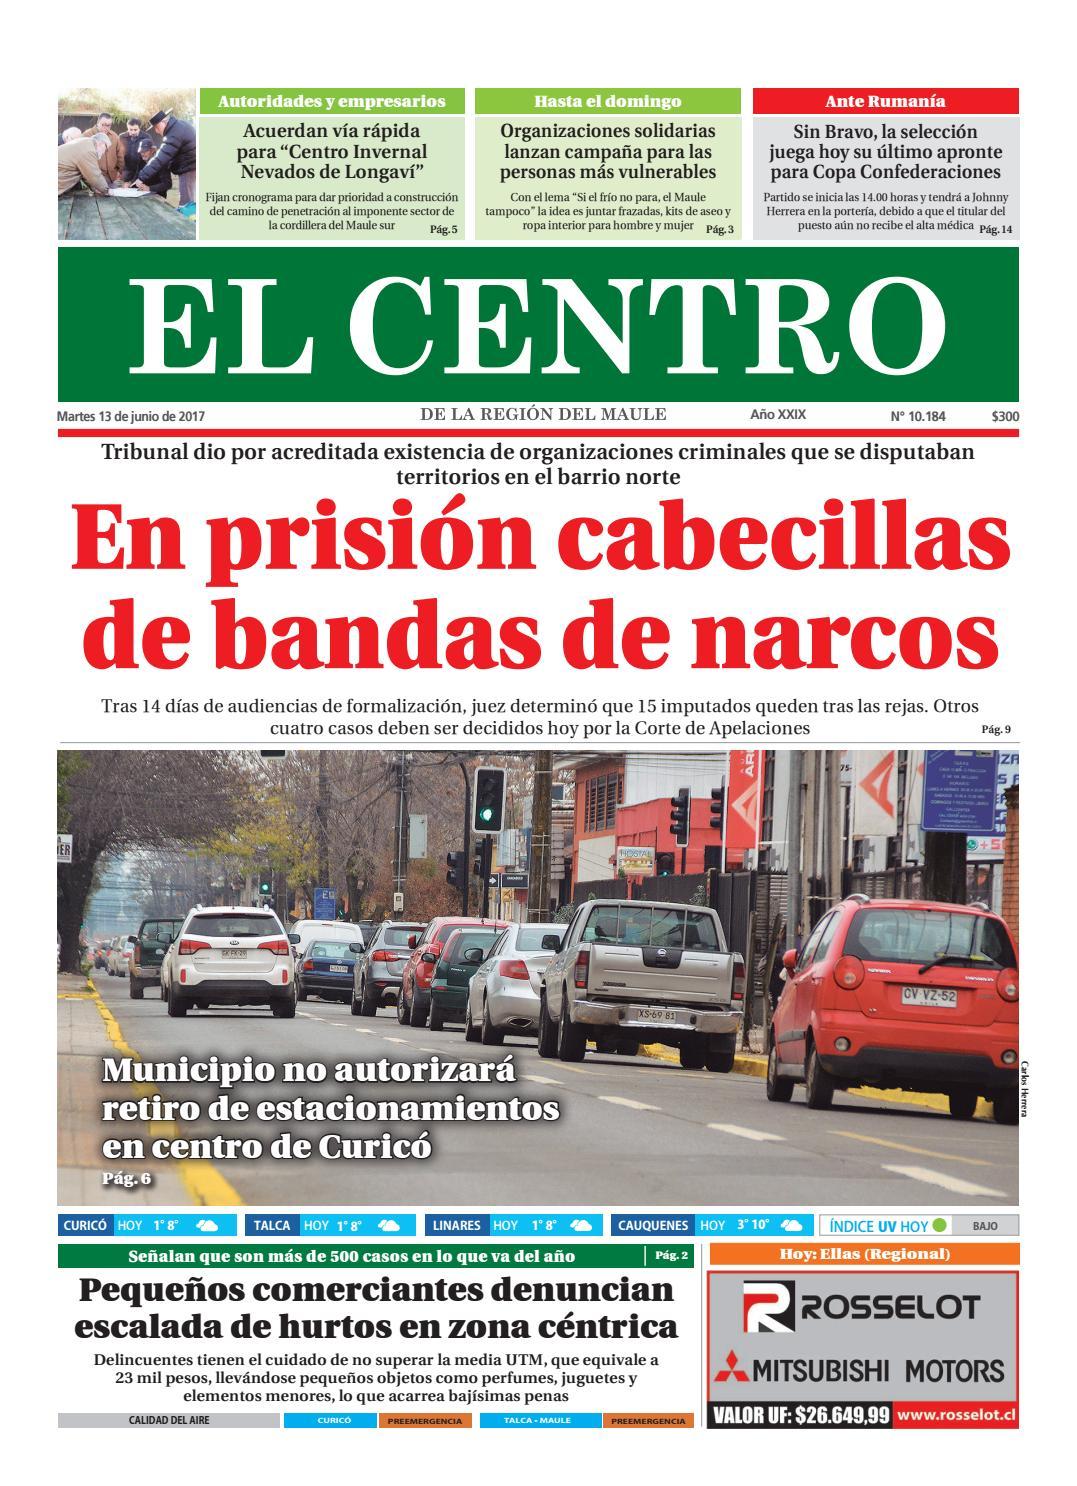 Calendario Academico Ucm 2020 2020.Diario 1306 2017 By Diario El Centro S A Issuu